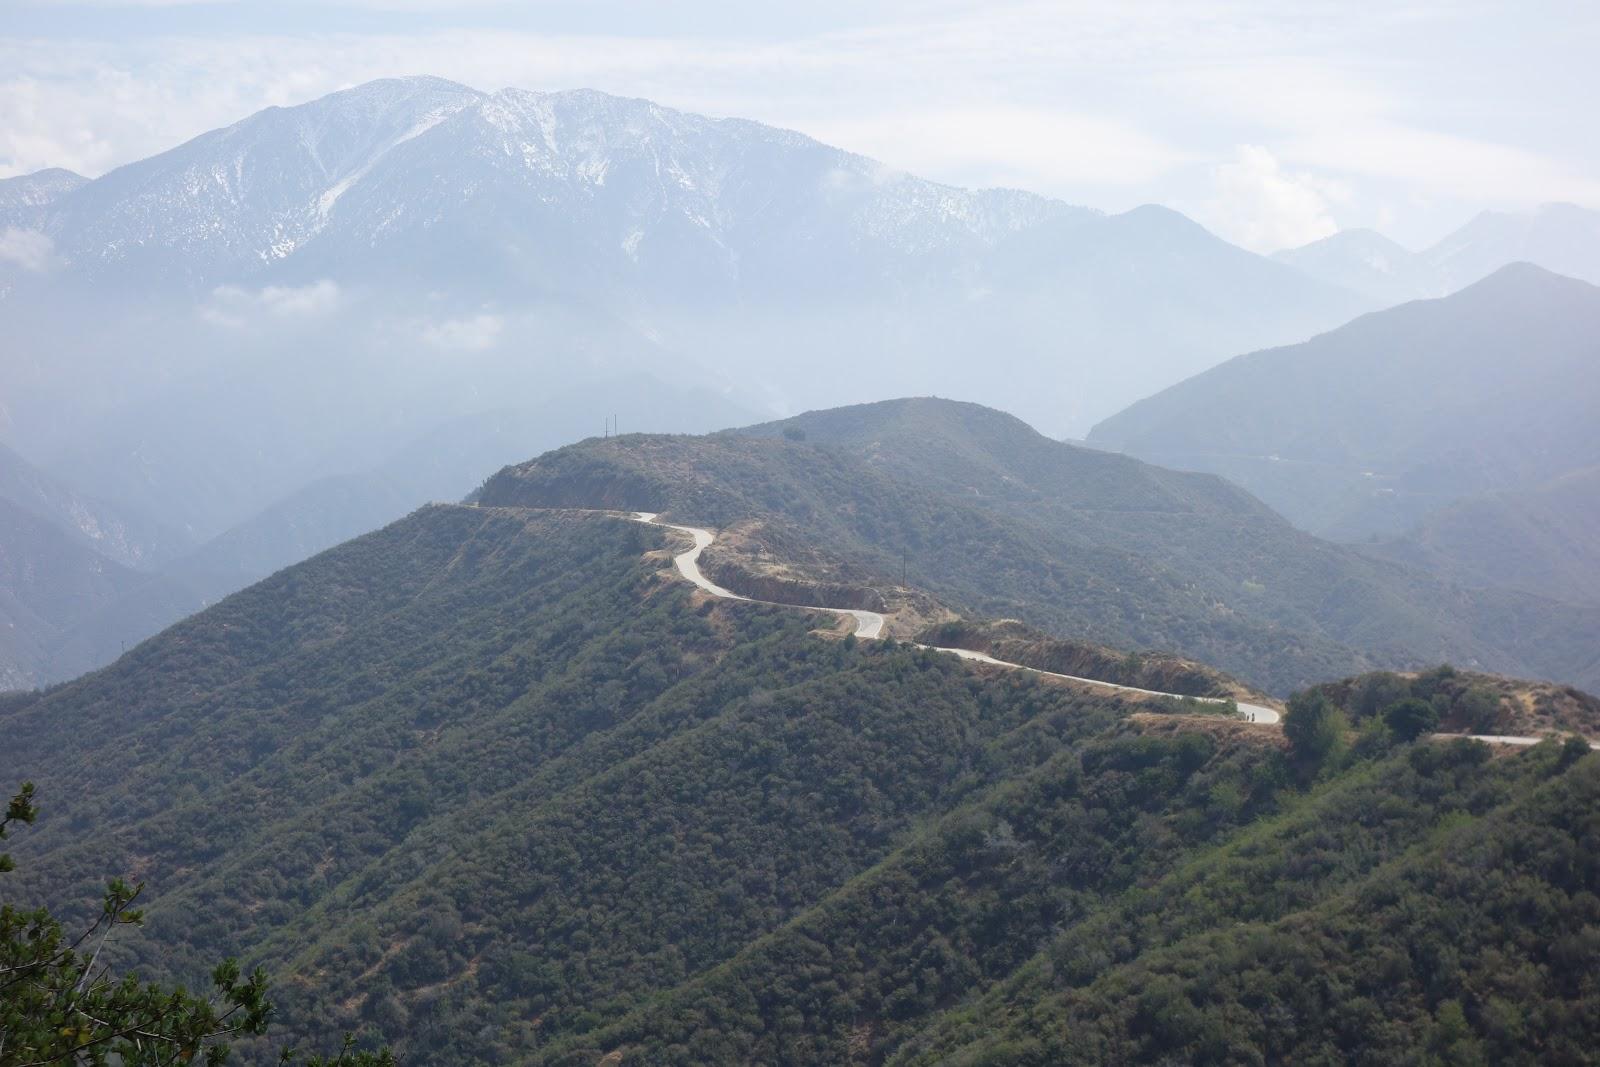 Bike climb on GMR - view of roadway and ridgeline